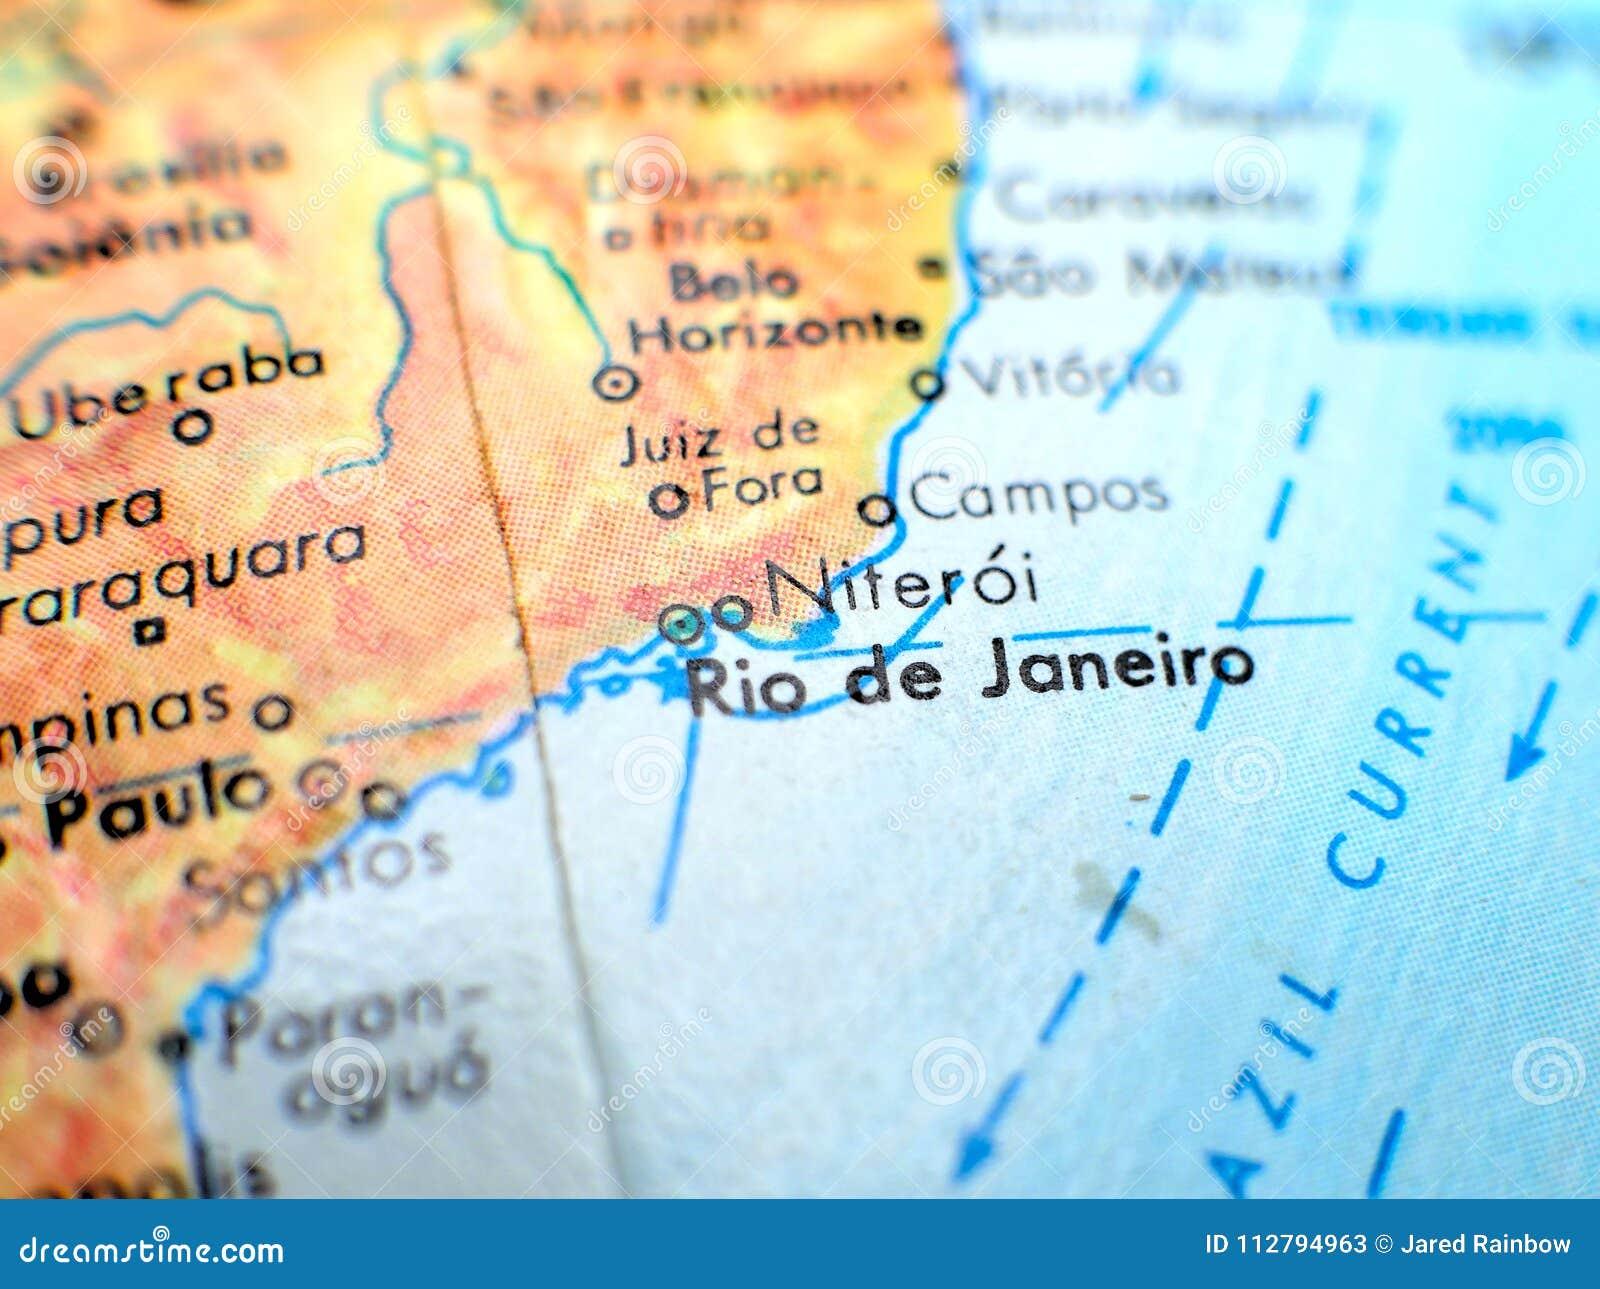 Rio De Janeiro Brazil Focus Macro Shot On Globe Map For Travel Blogs ...